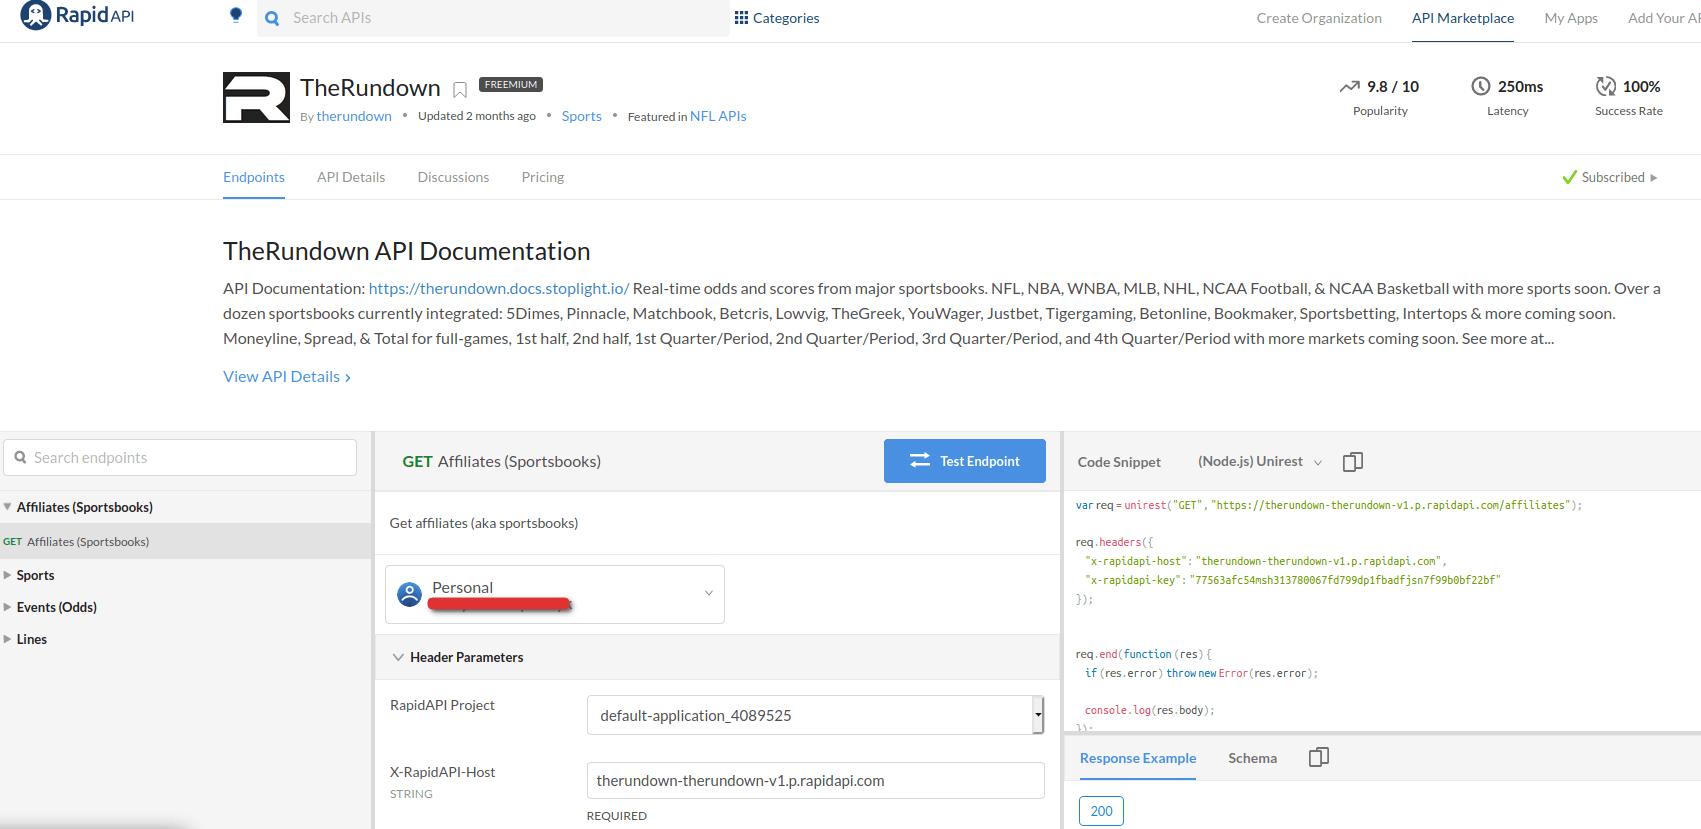 TheRundown API